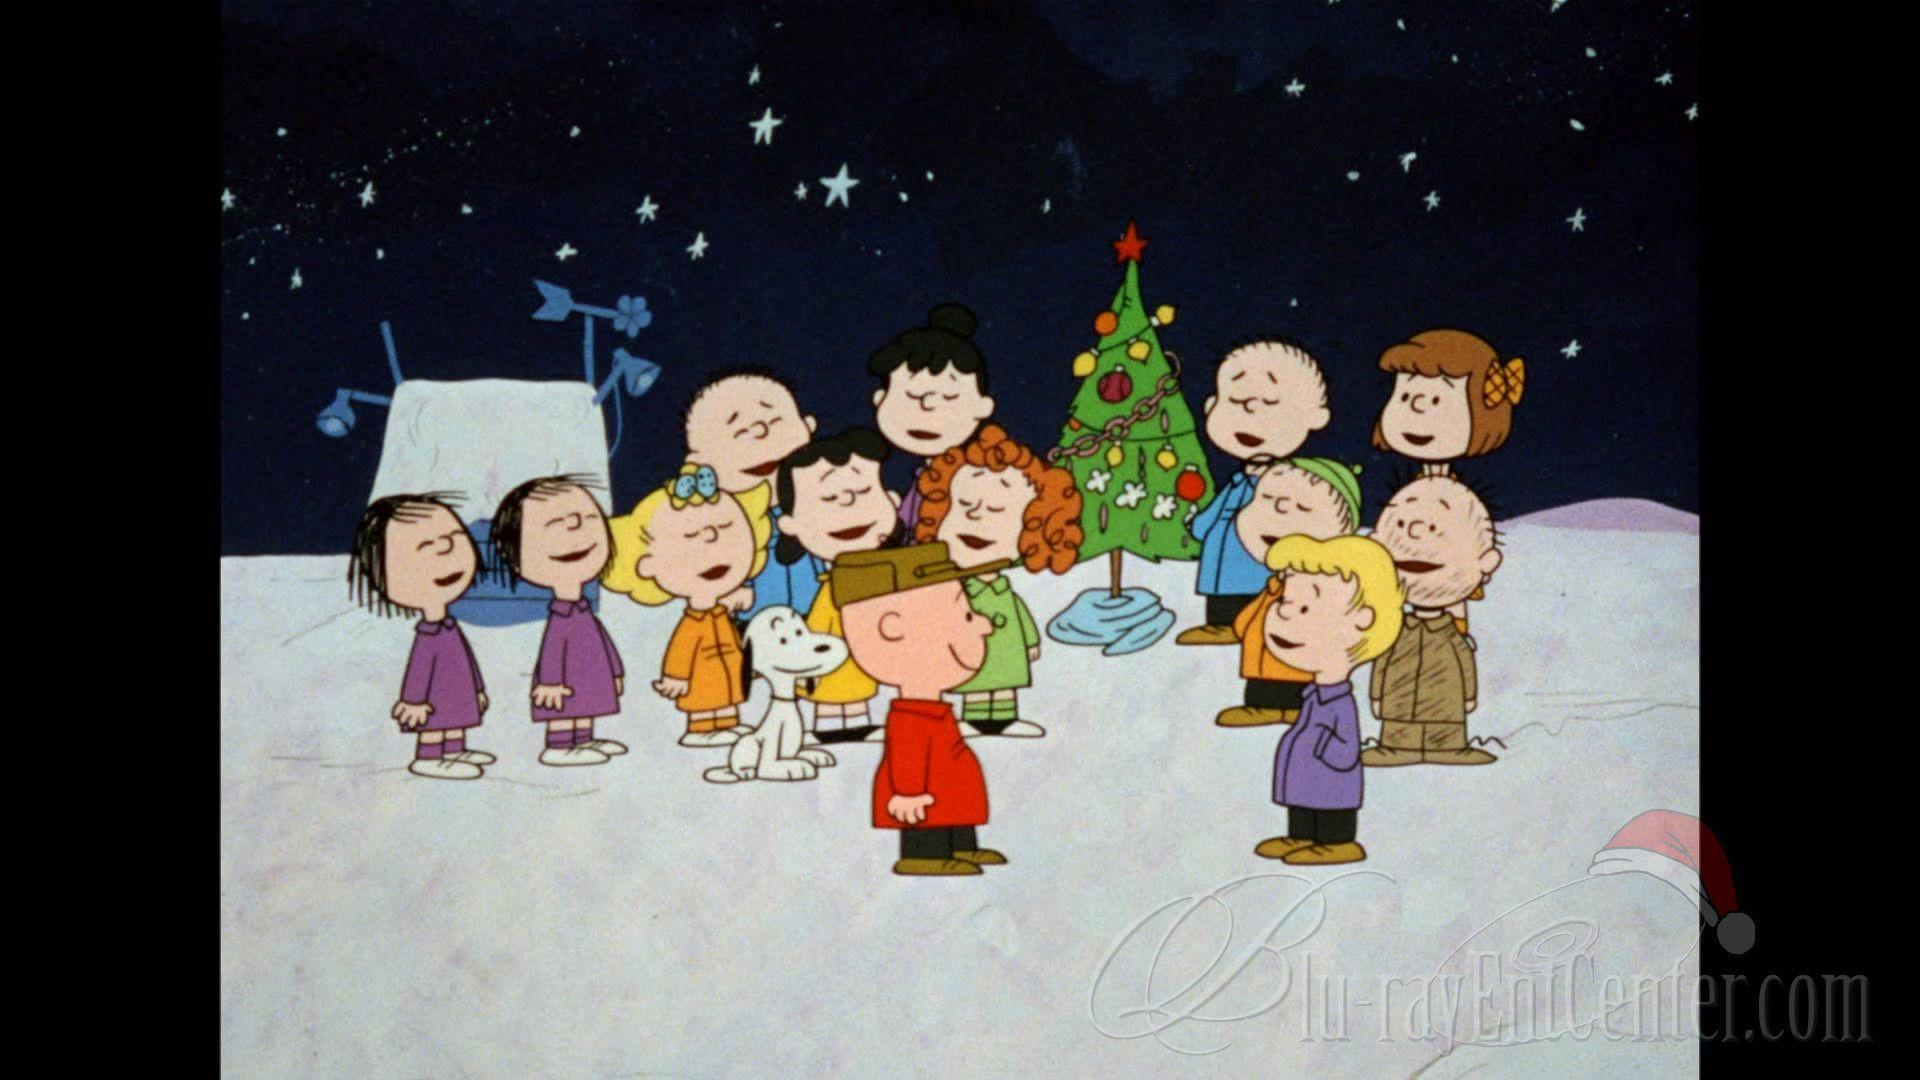 Charlie Brown Christmas Wallpapers Desktop 1920x1080